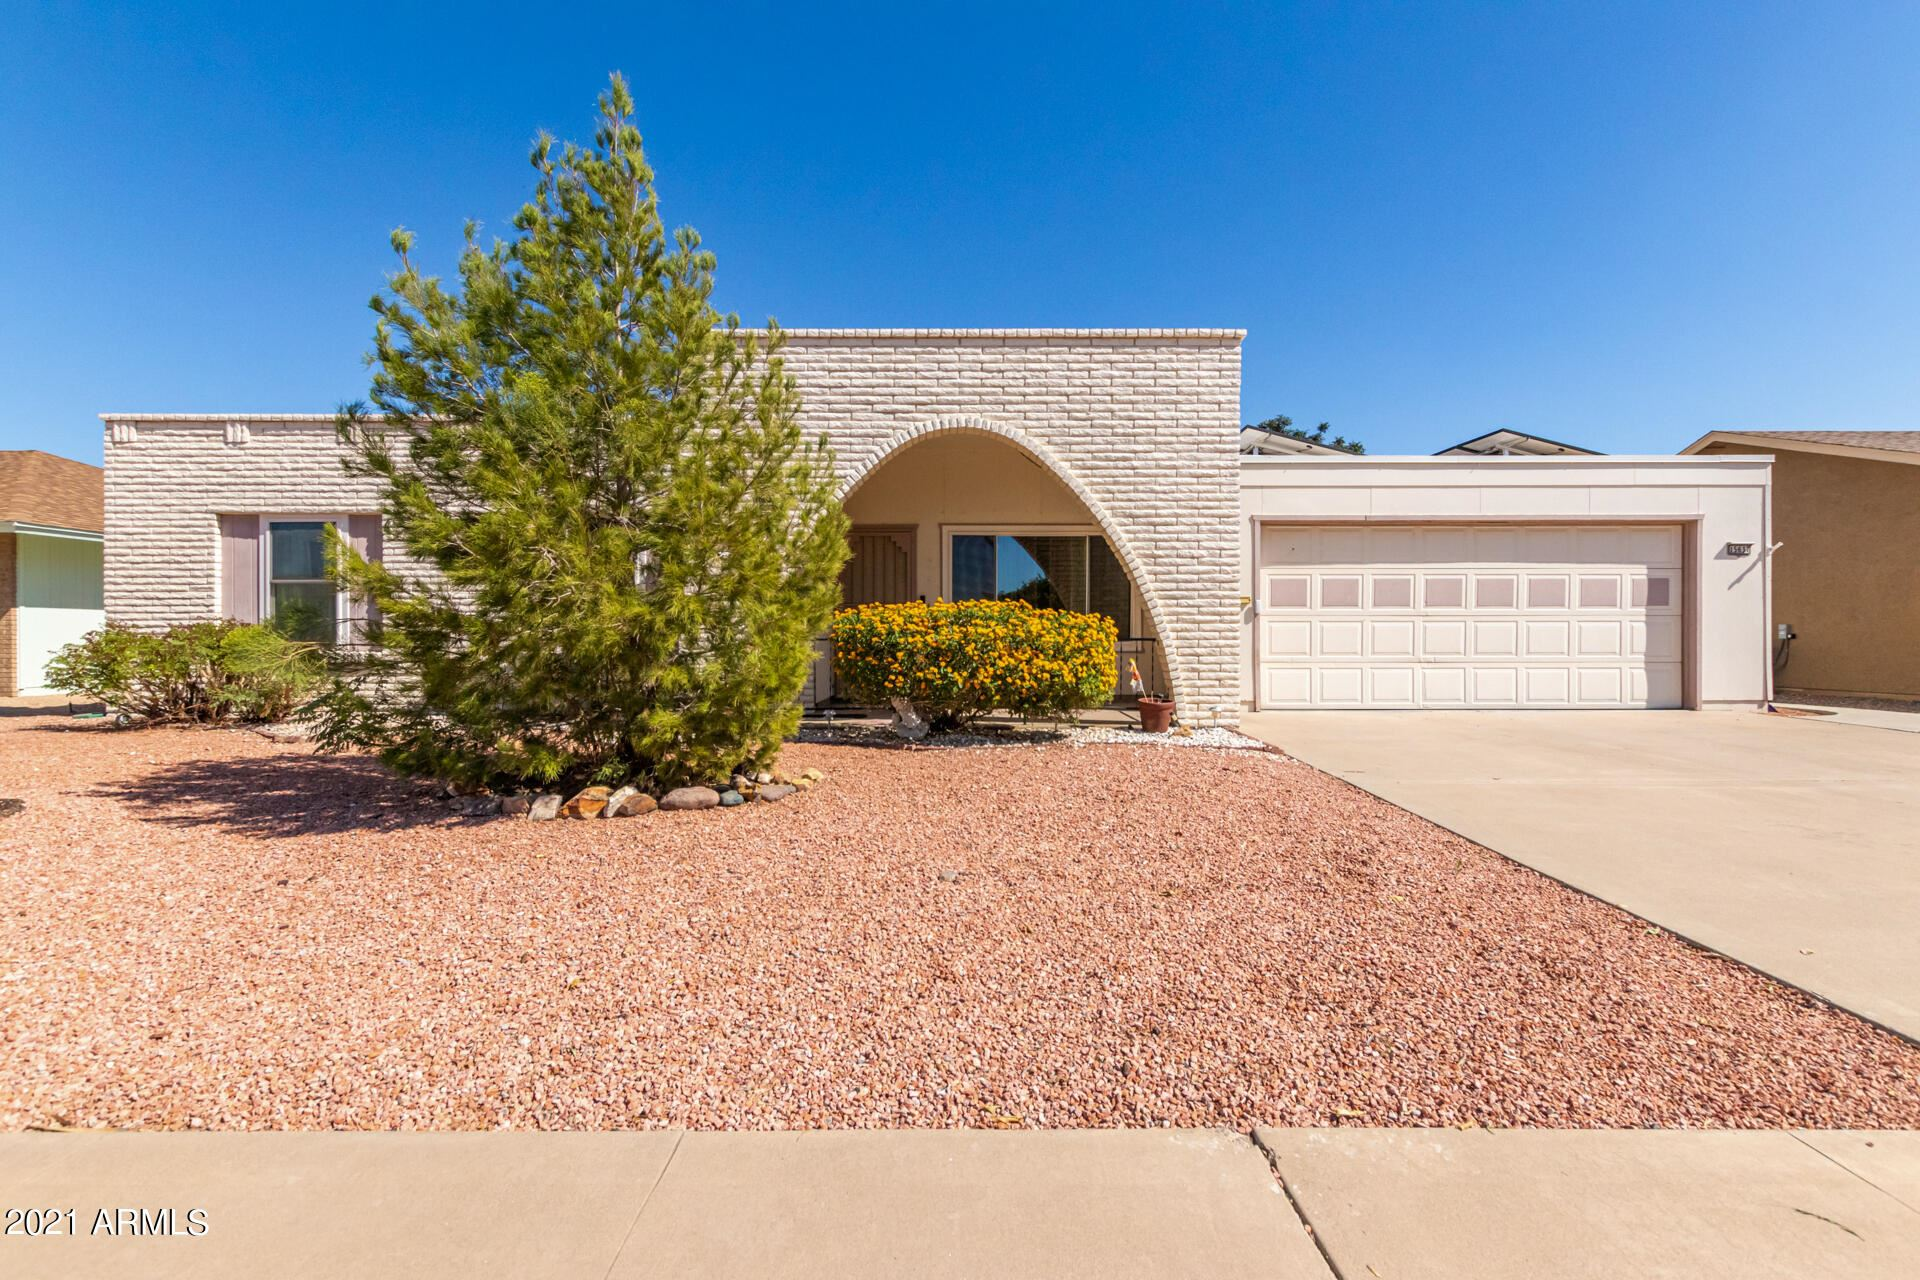 Photo of 15637 N MEADOW PARK Drive, Sun City, AZ 85351 (MLS # 6307875)